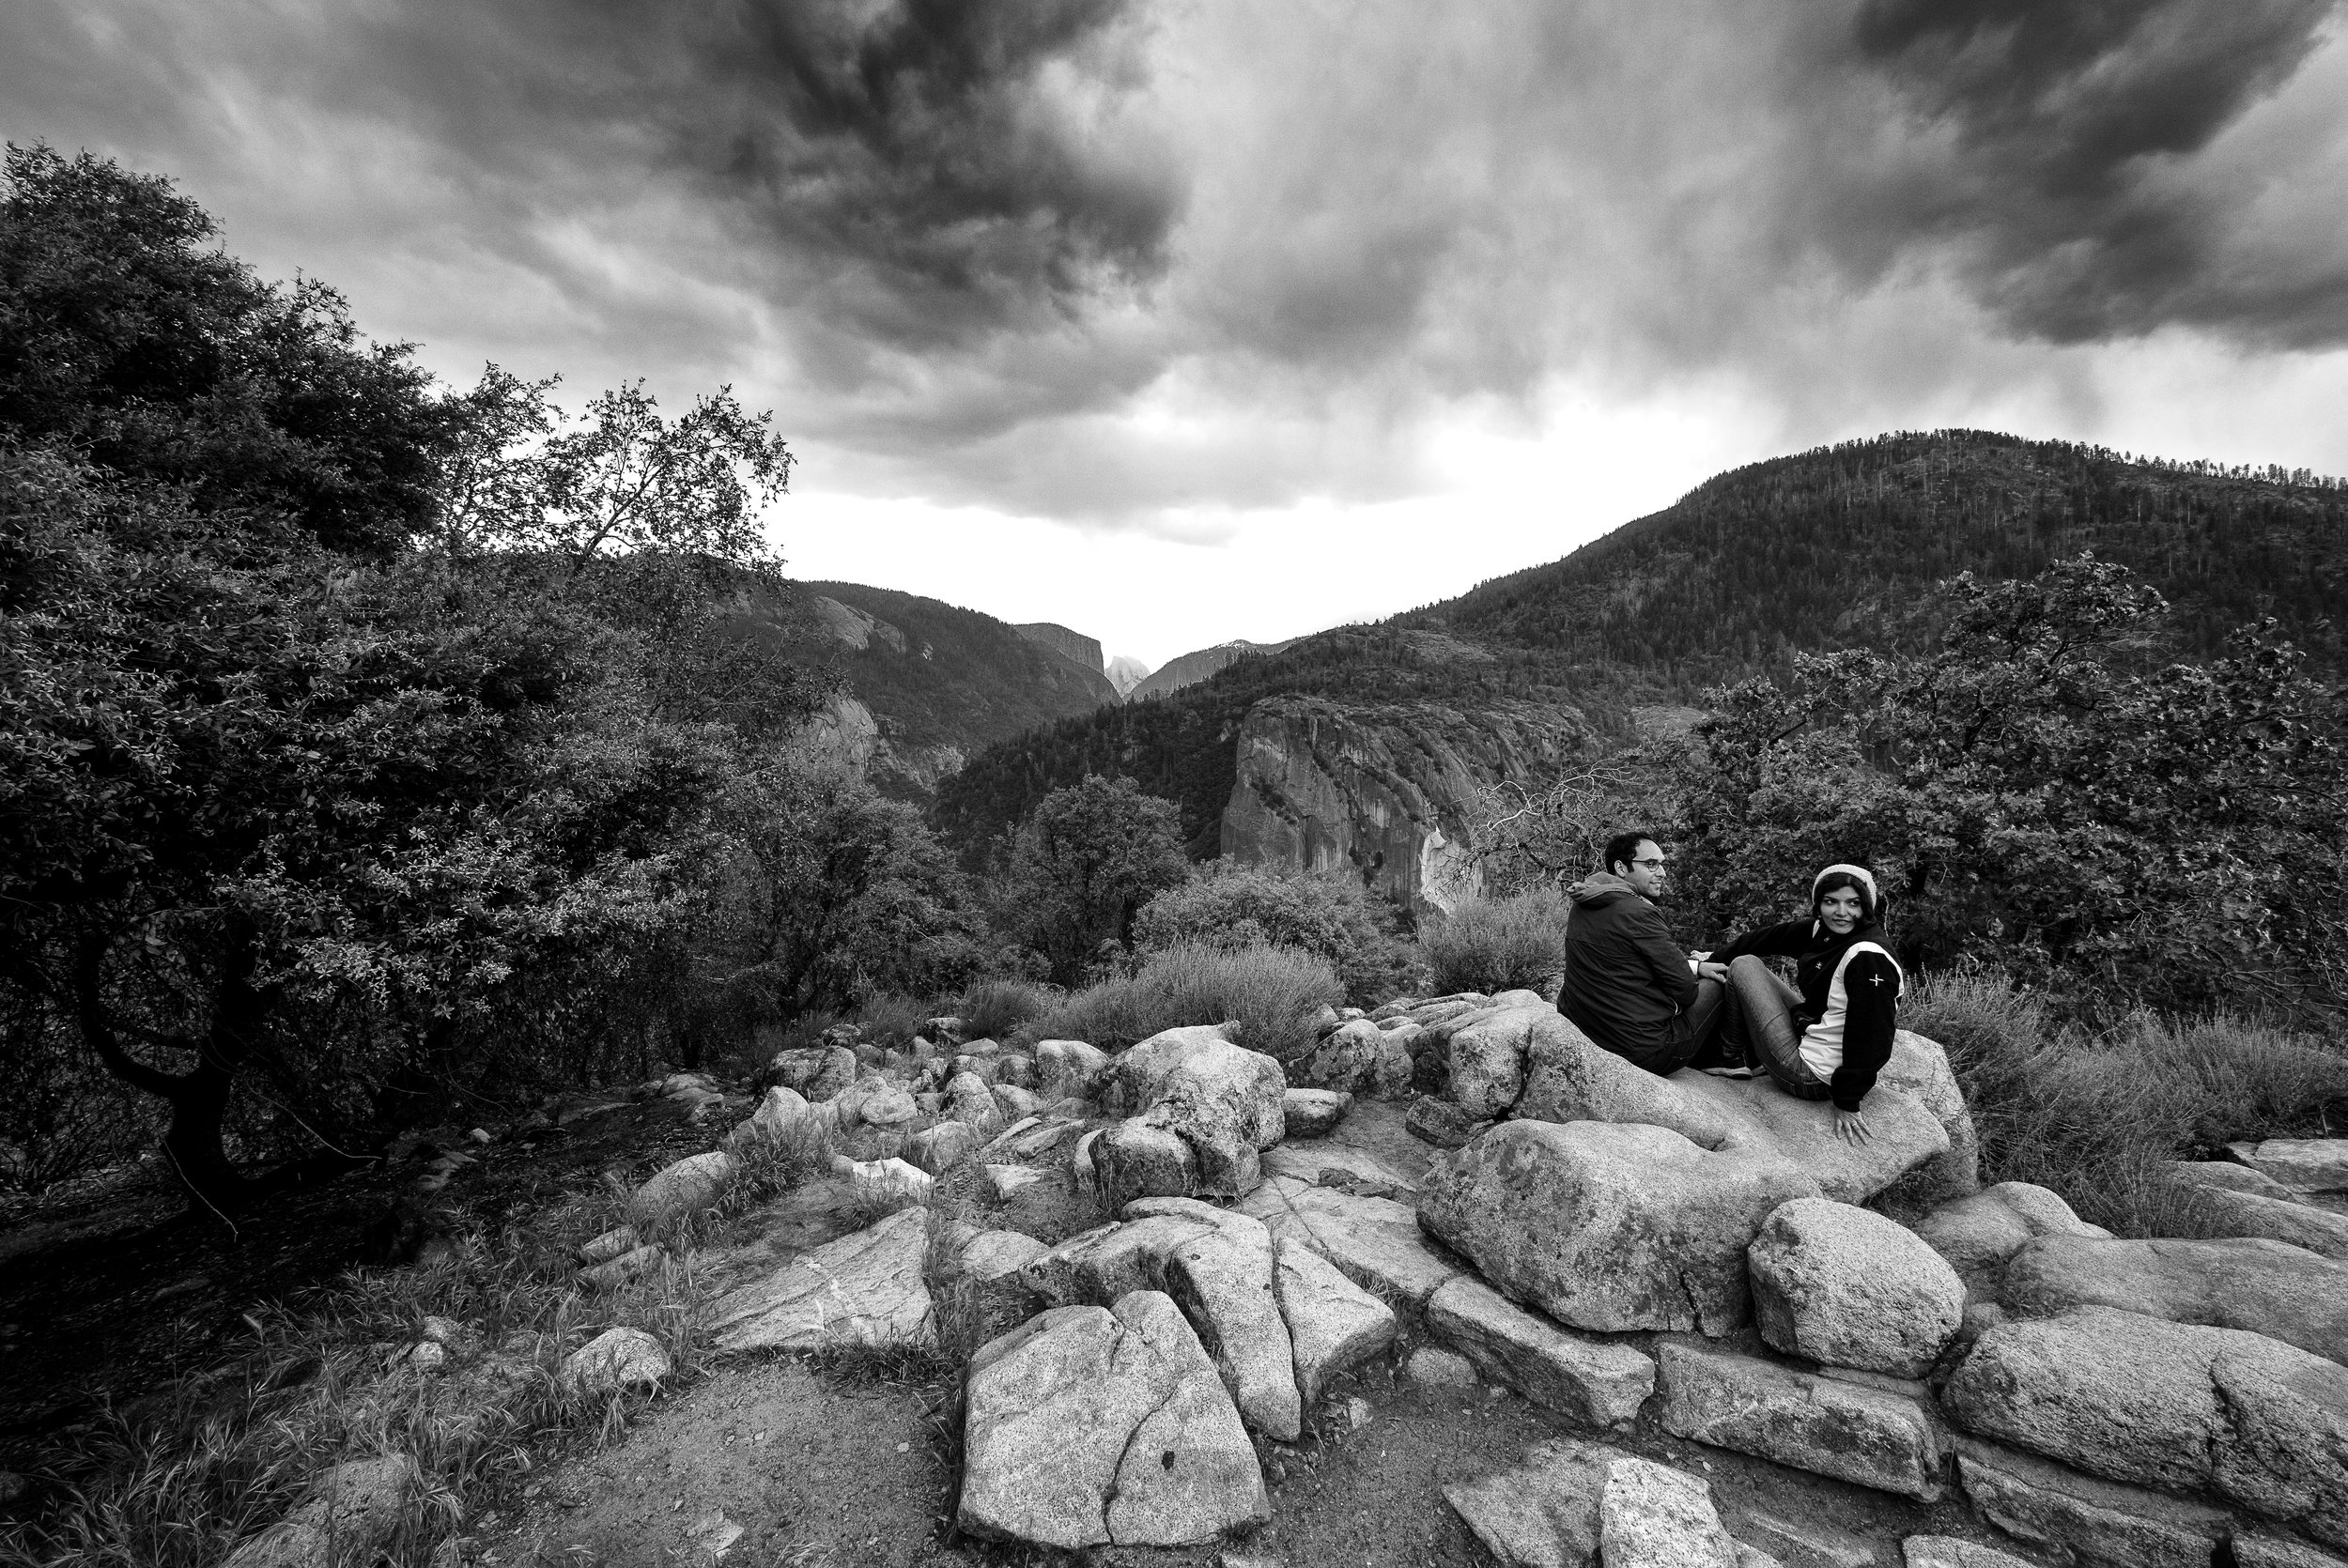 Strangers in Yosemite National Park overlooking El Cap and Half Dome